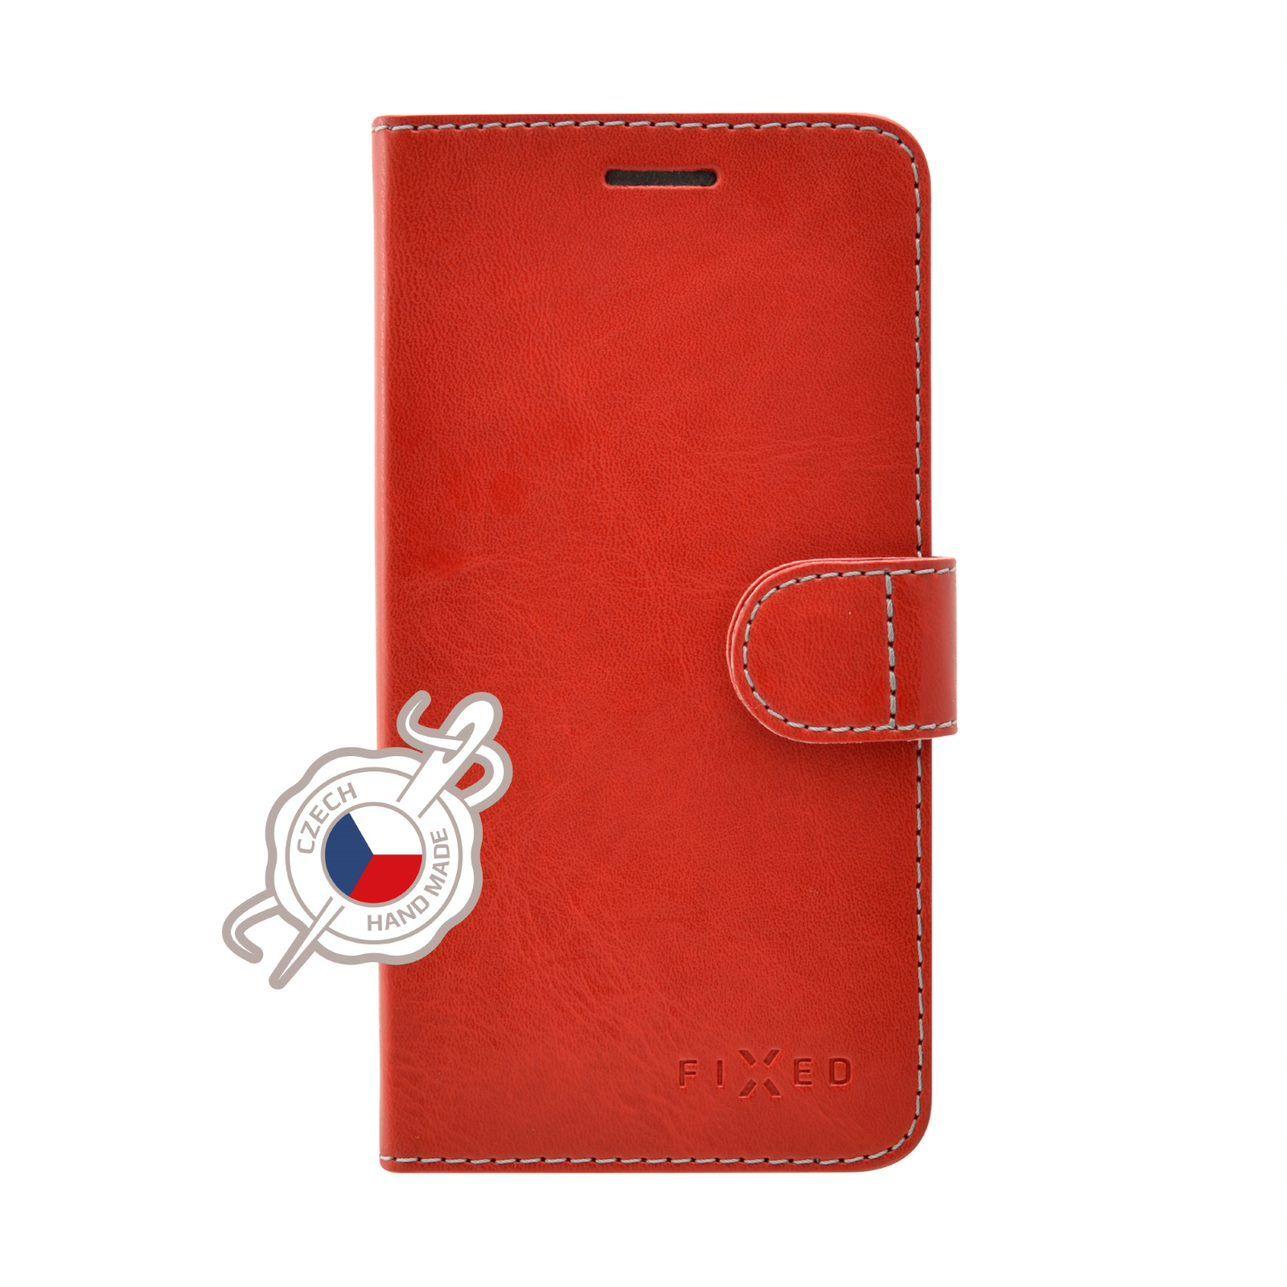 Pouzdro typu kniha FIXED FIT pro Xiaomi Redmi Note 8T, červené